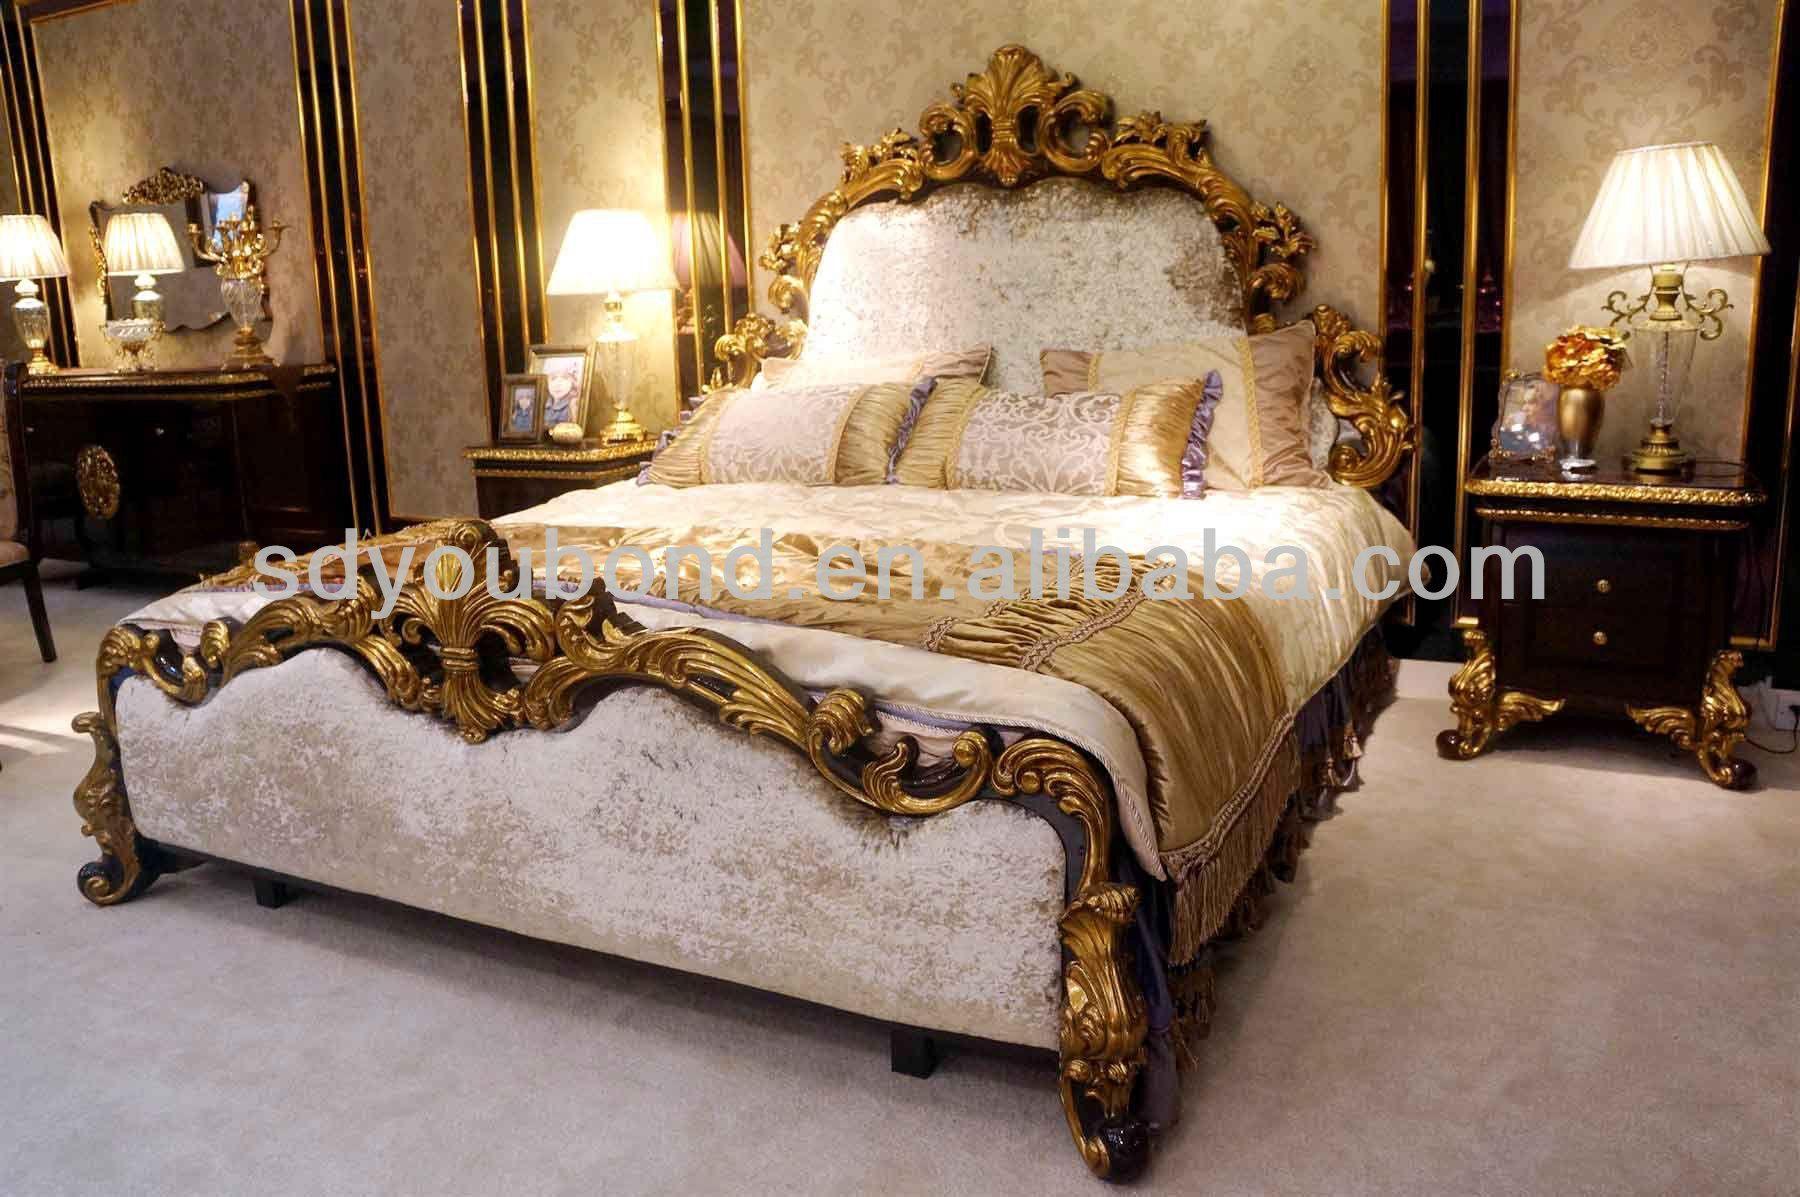 Klassische Italienische Schlafzimmer, Italienische Möbel ...